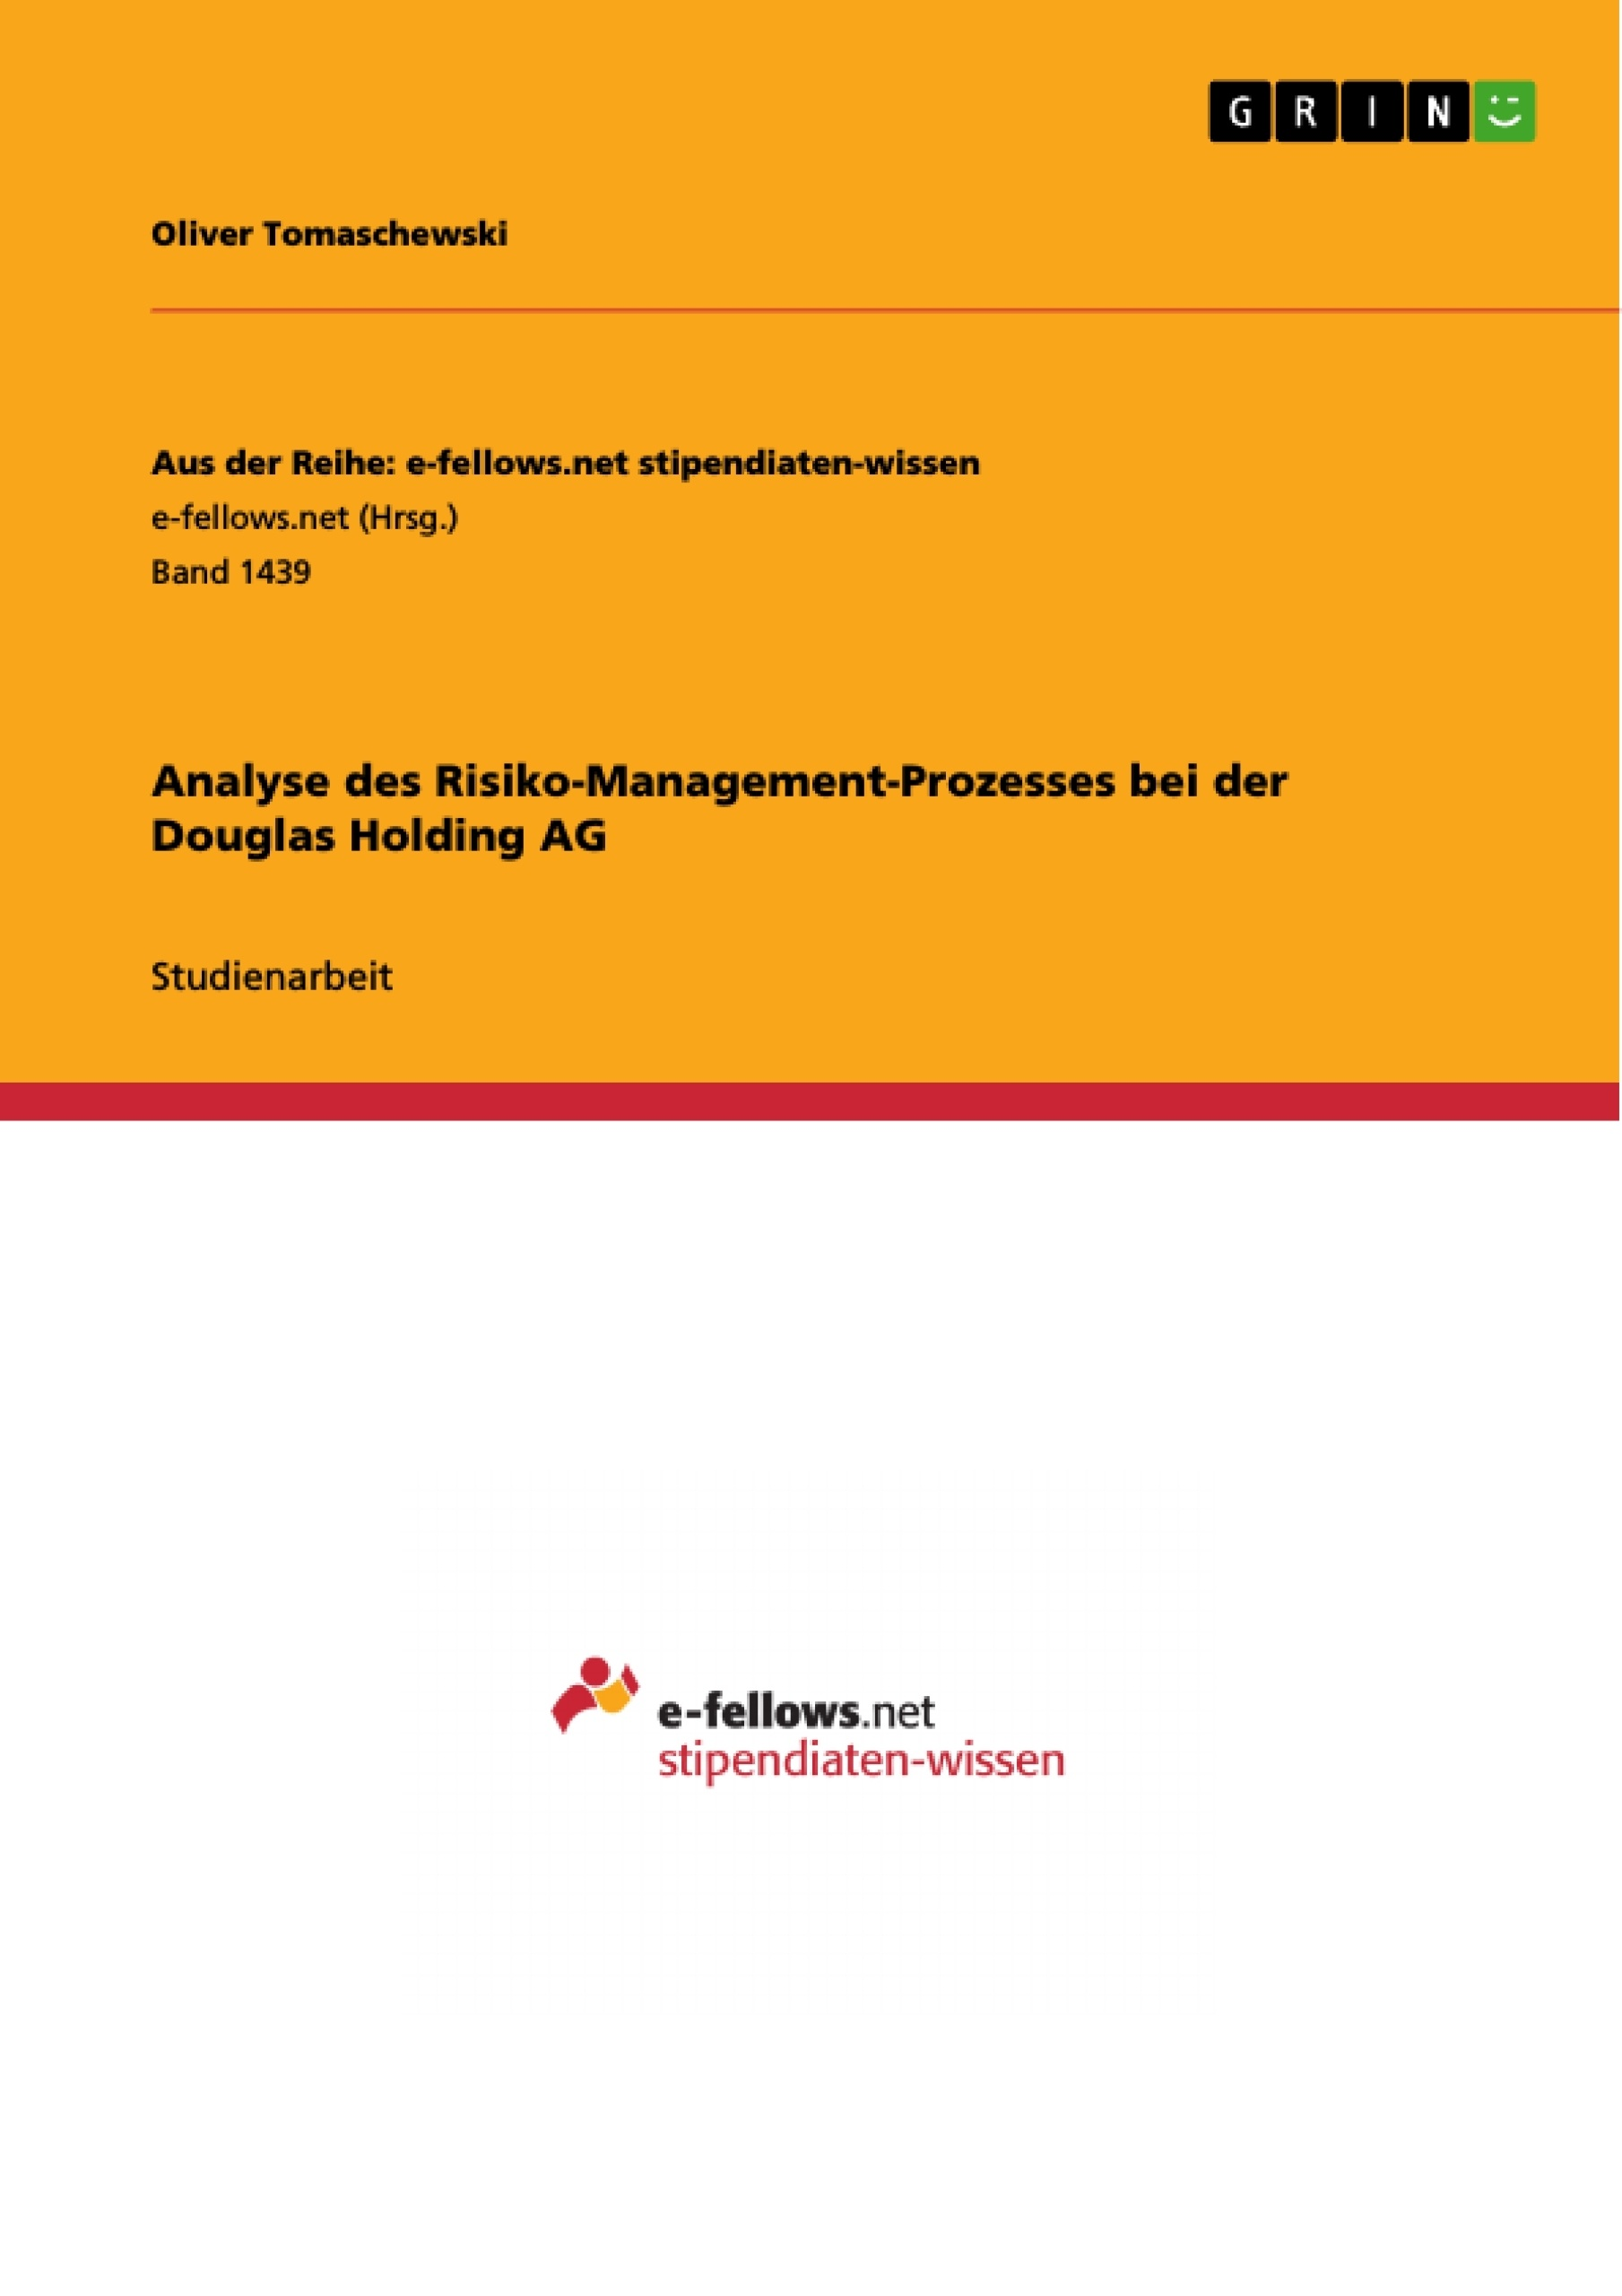 Titel: Analyse des Risiko-Management-Prozesses bei der Douglas Holding AG